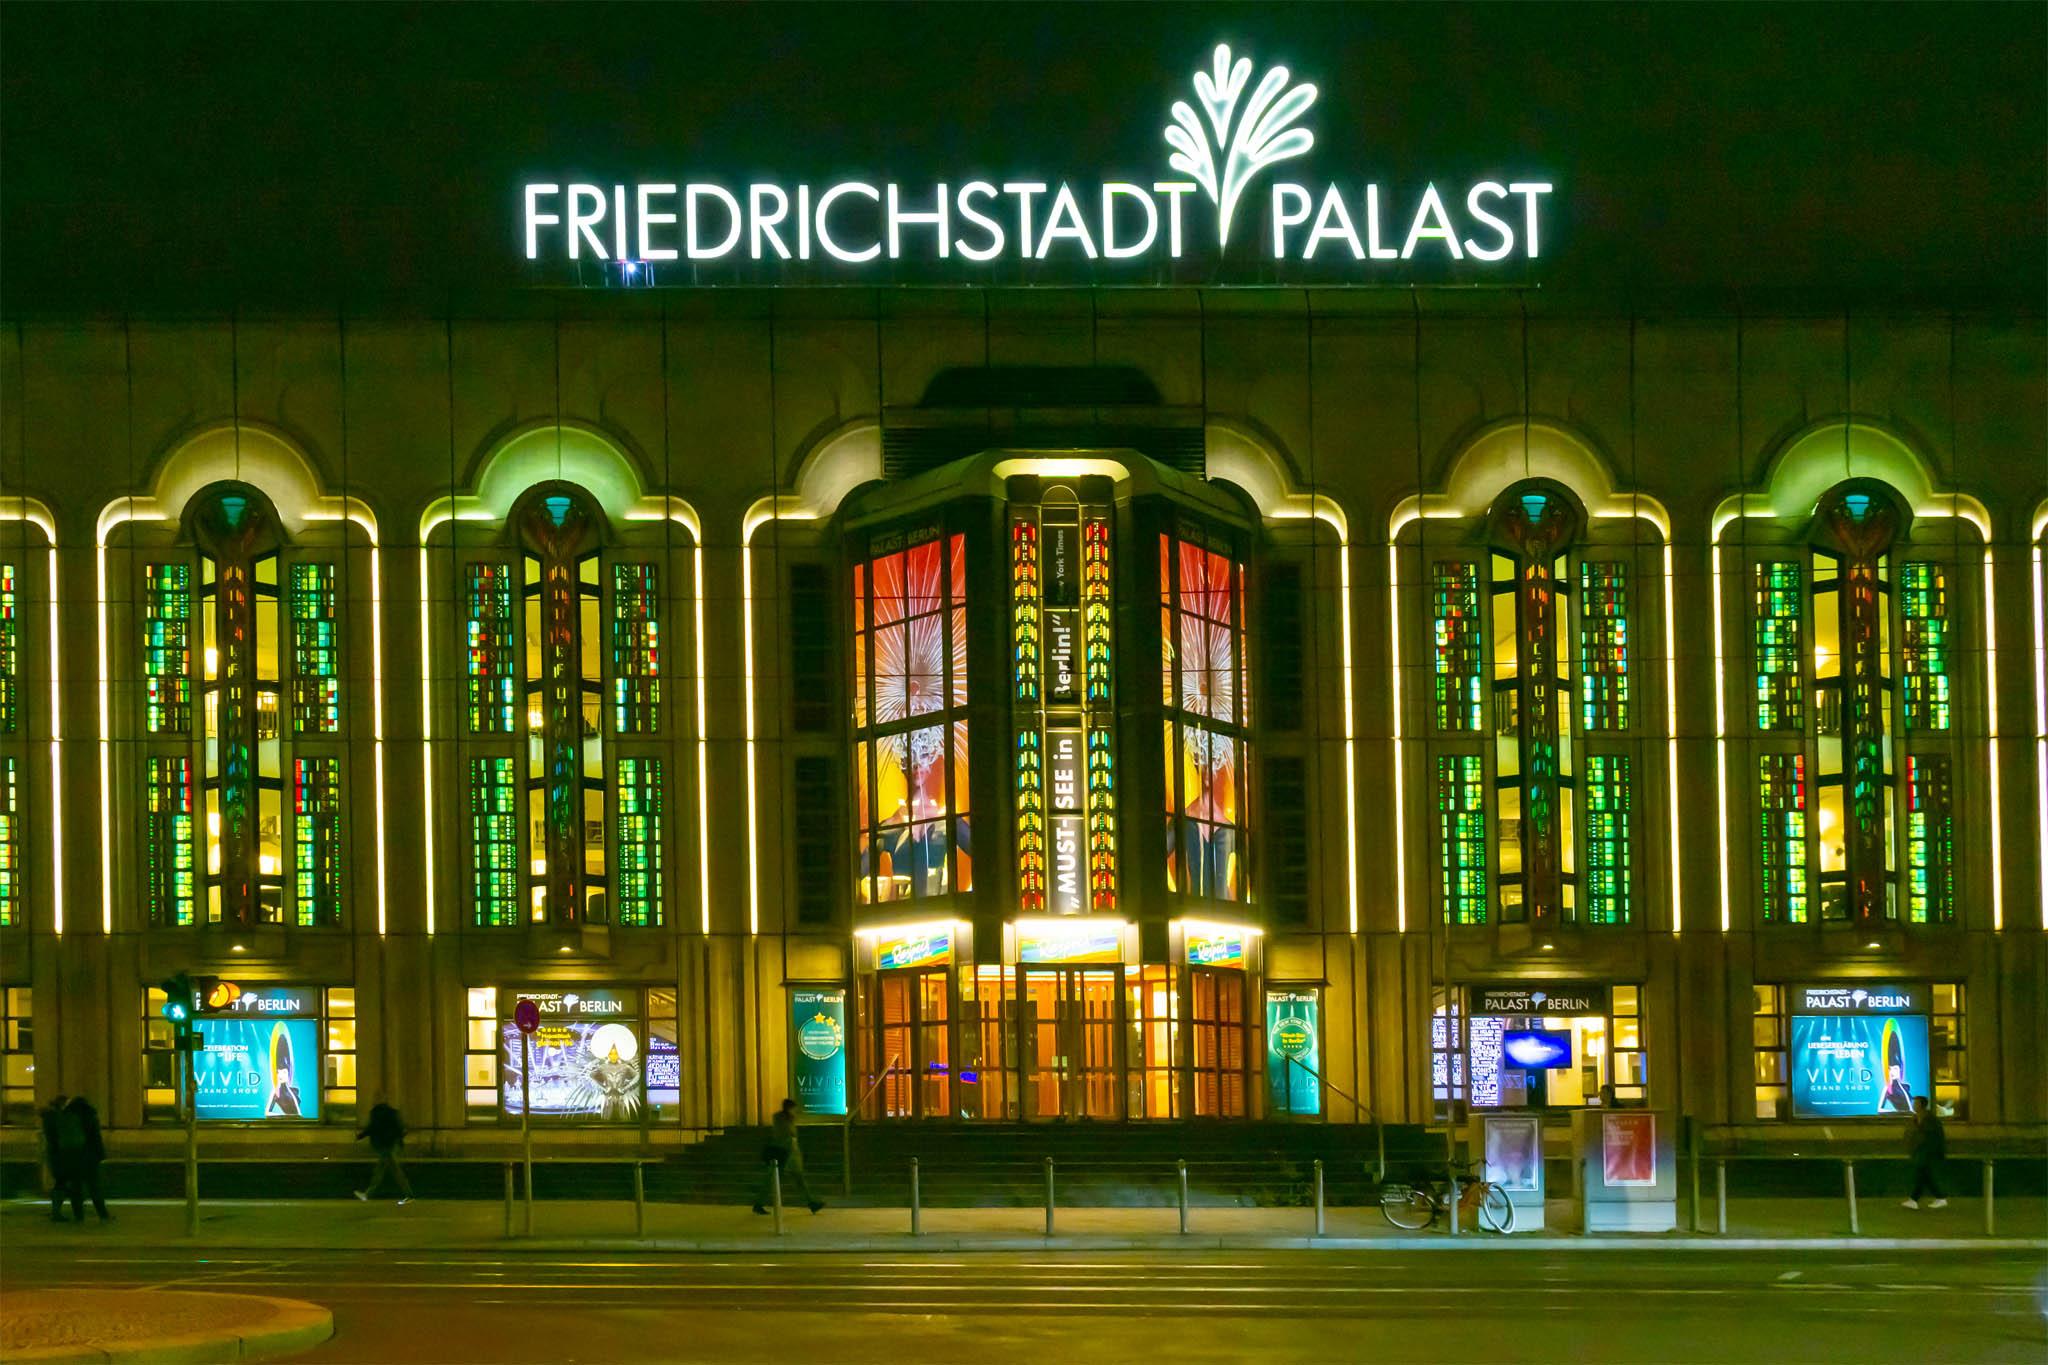 Friedrichstadtpalast, Germany